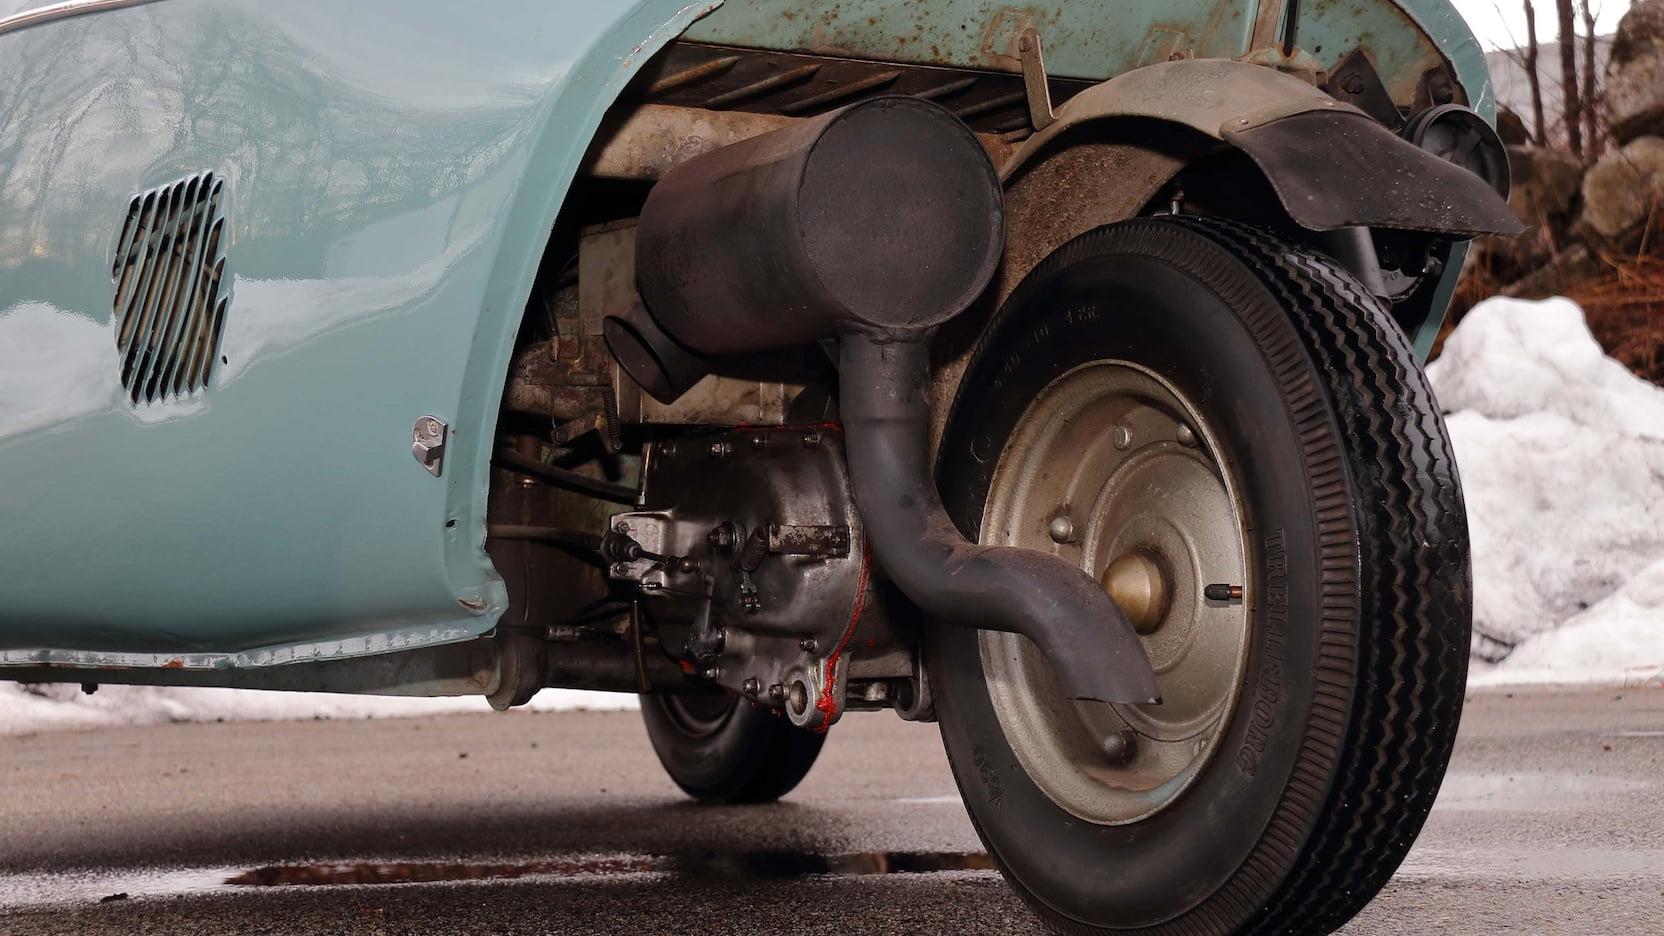 Heinkel Kabinenroller rear engine wheel drive